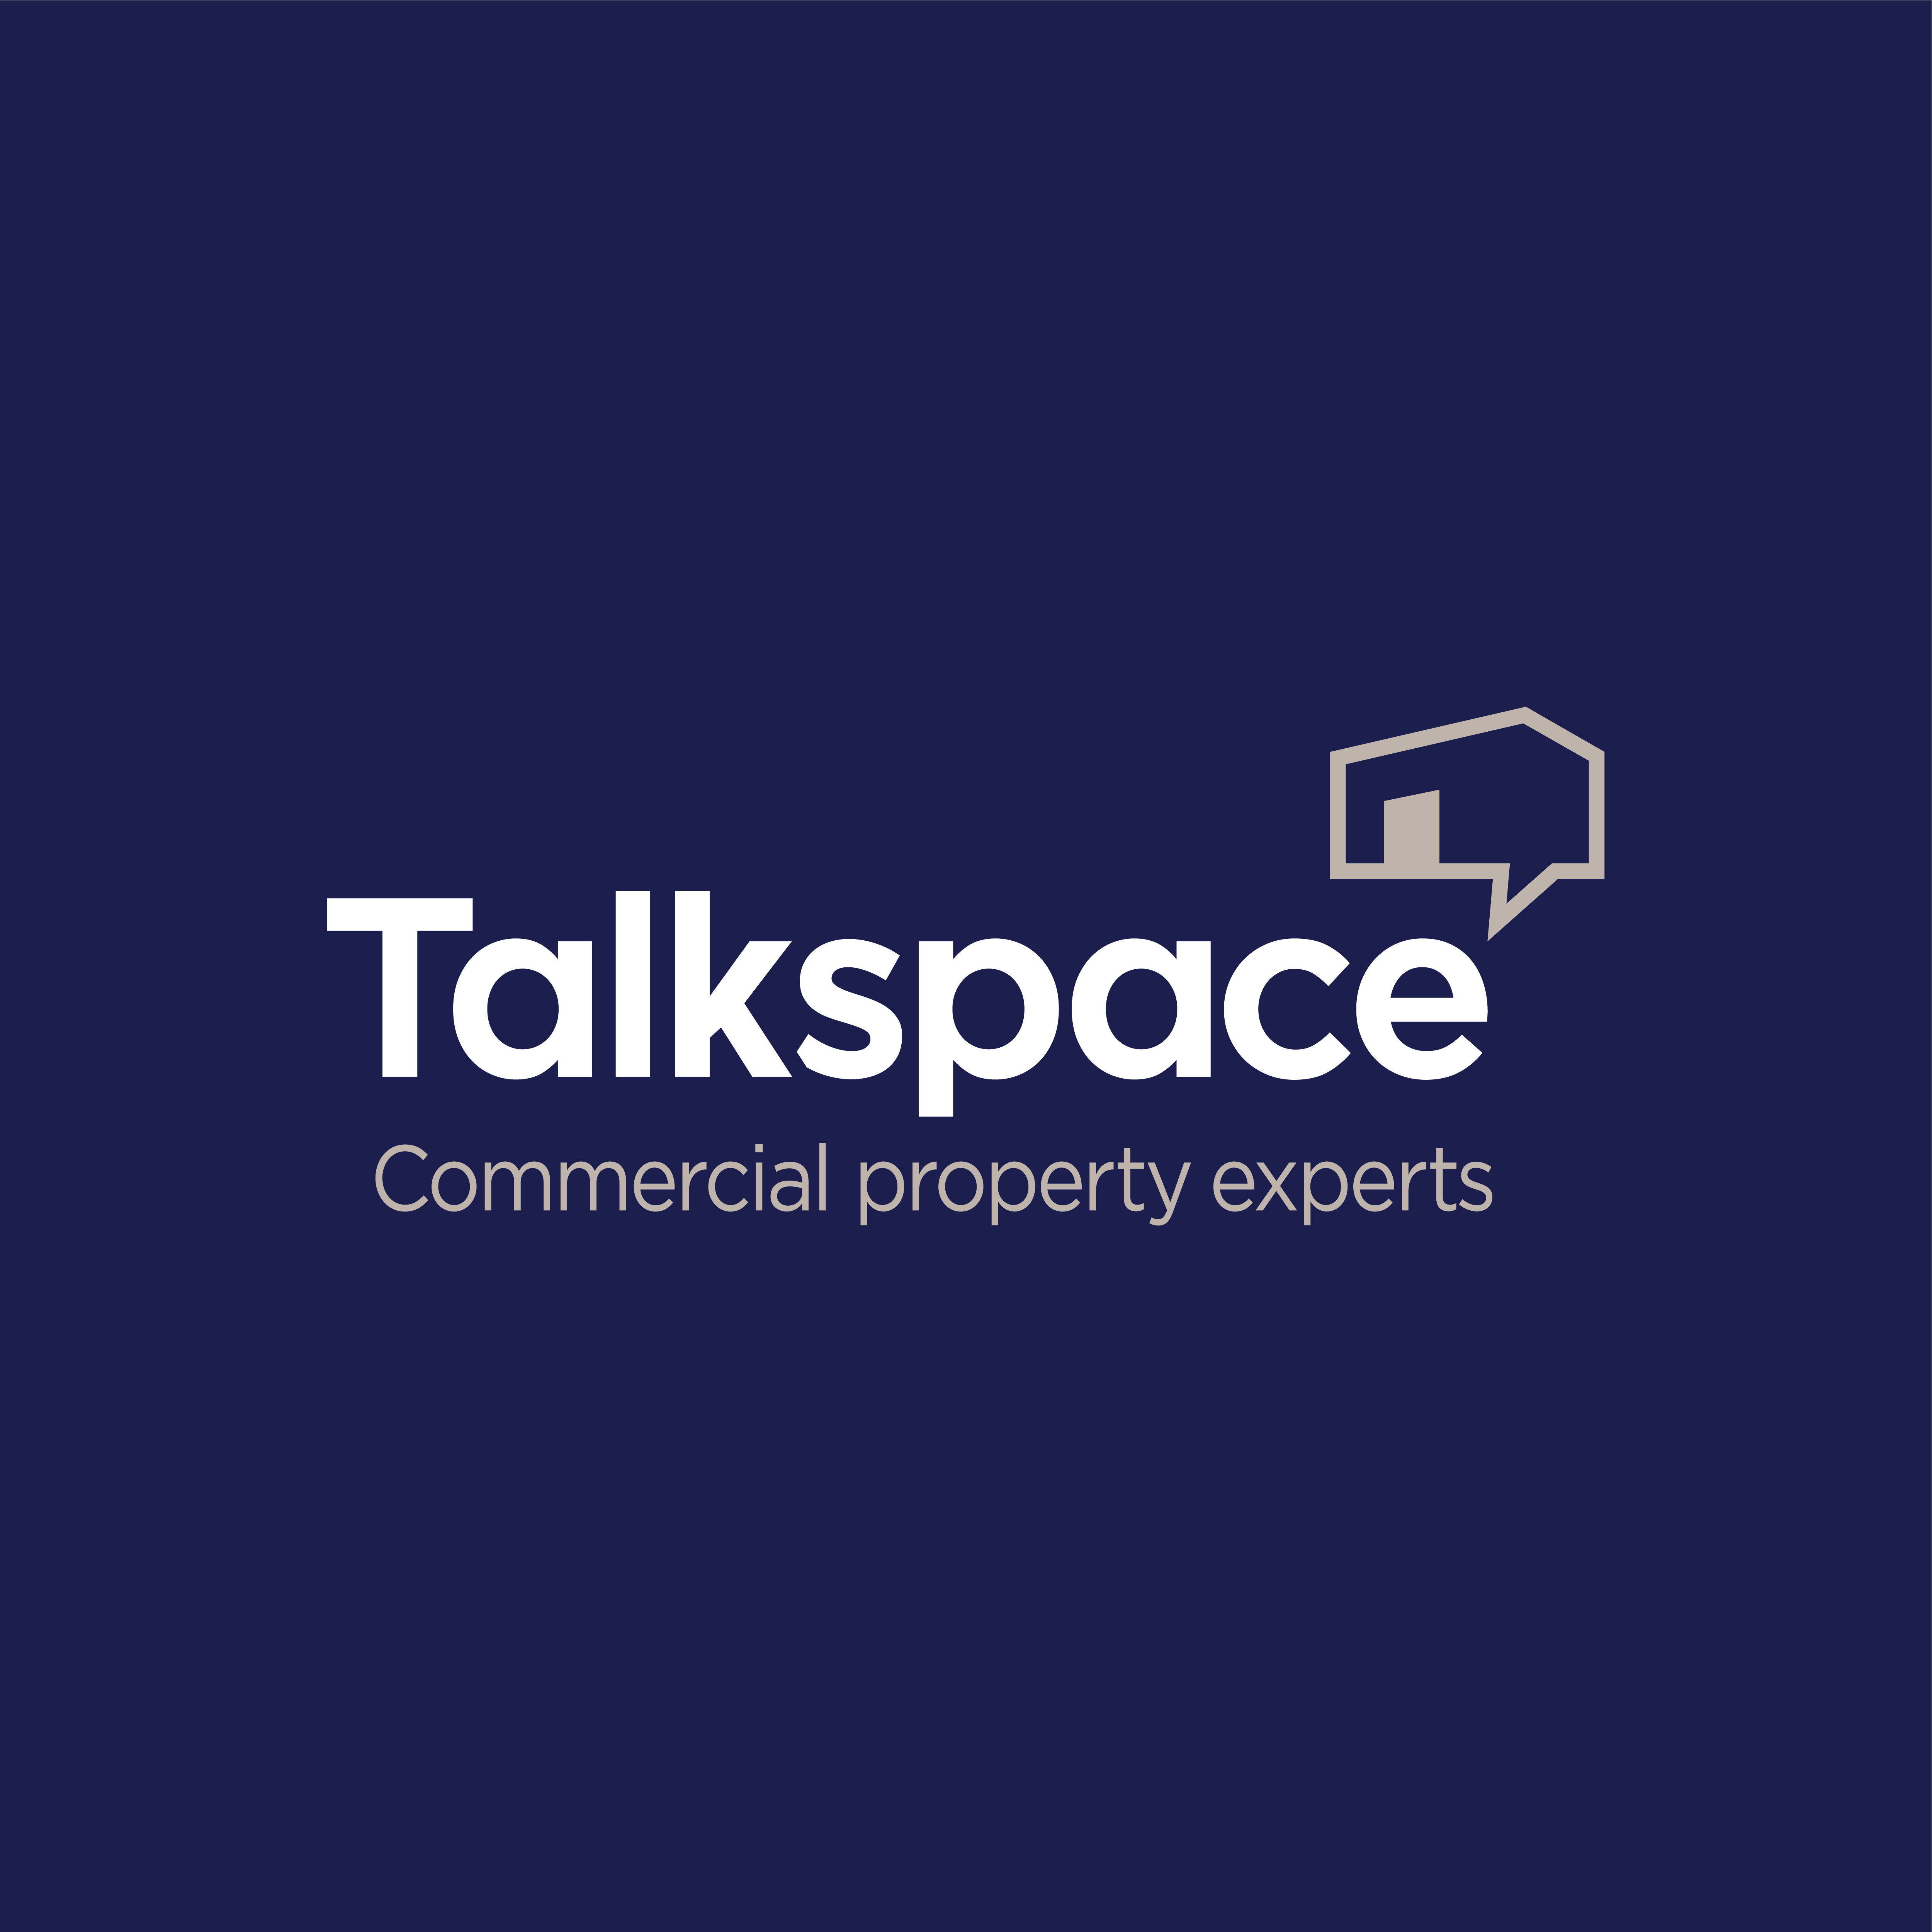 talkspace-branding-logo